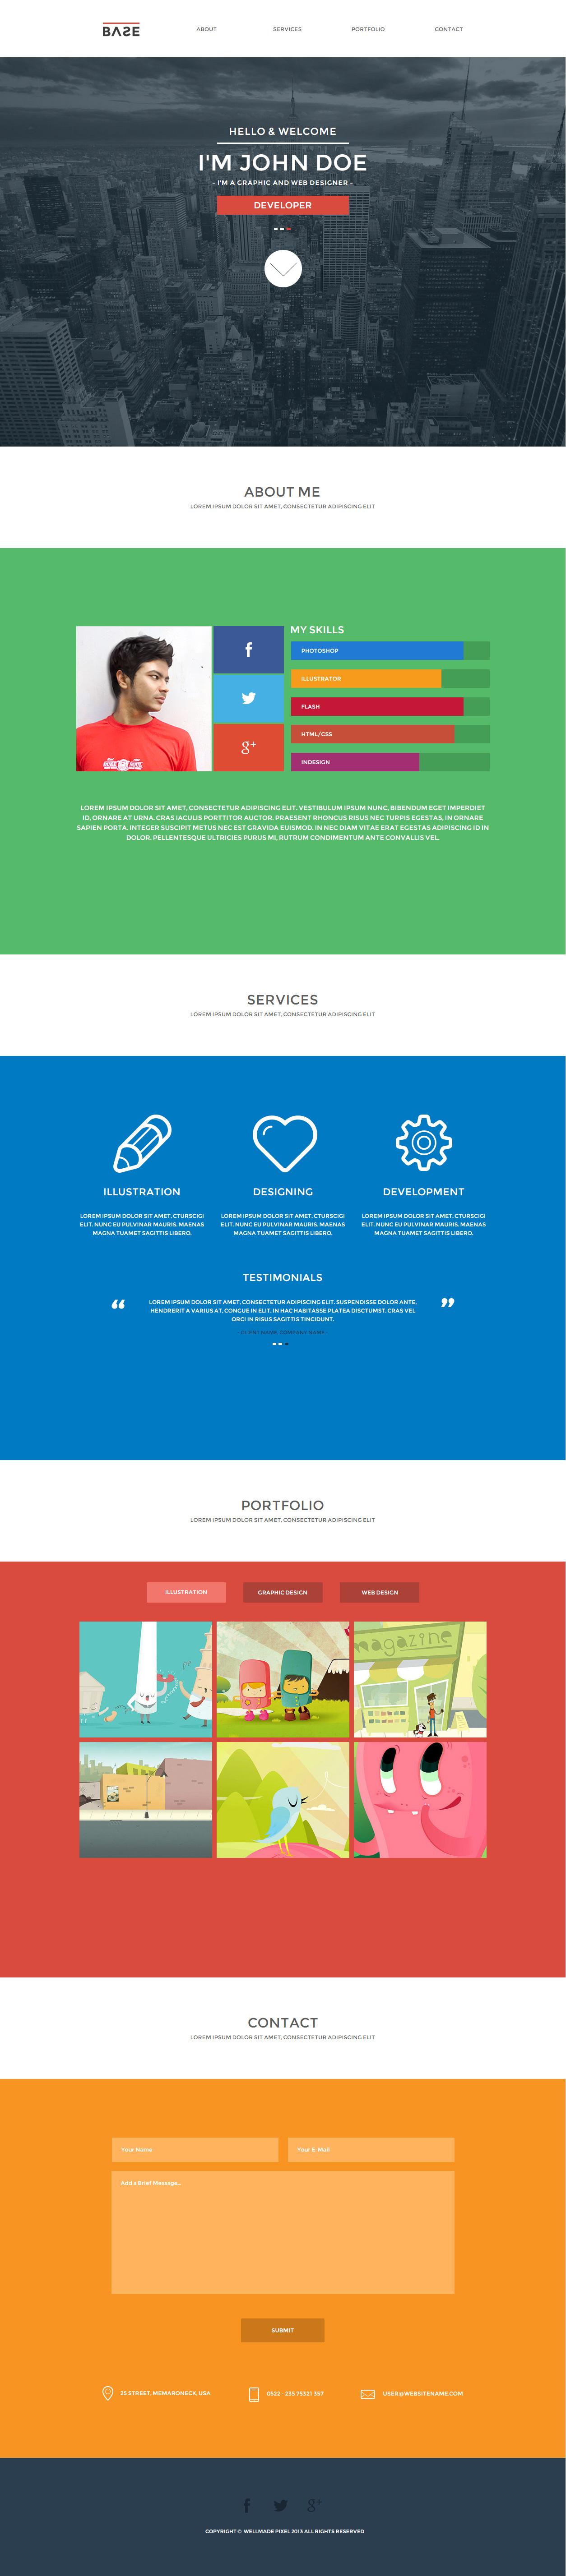 one page portfolio examples